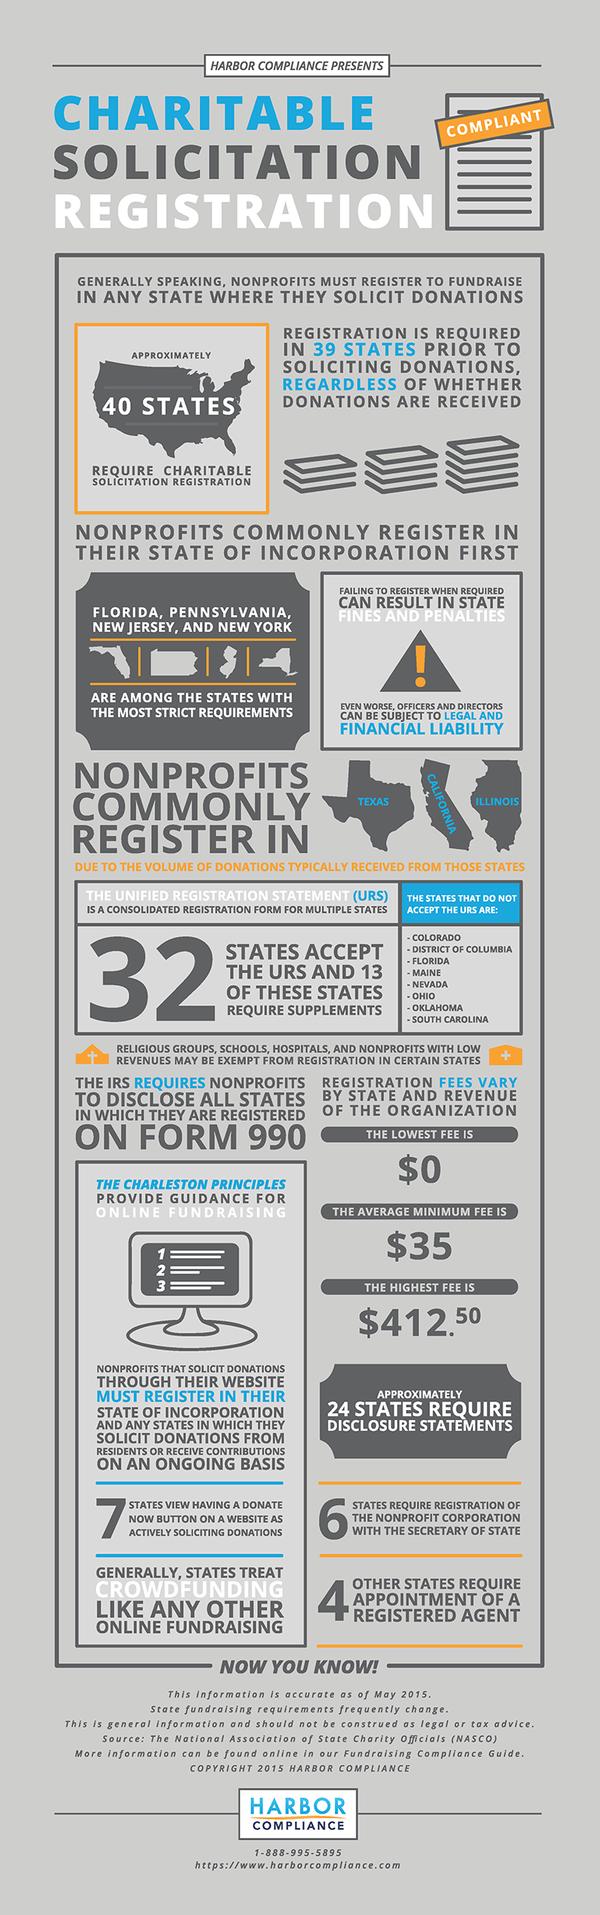 Charitable-solicitation-registration-infographic